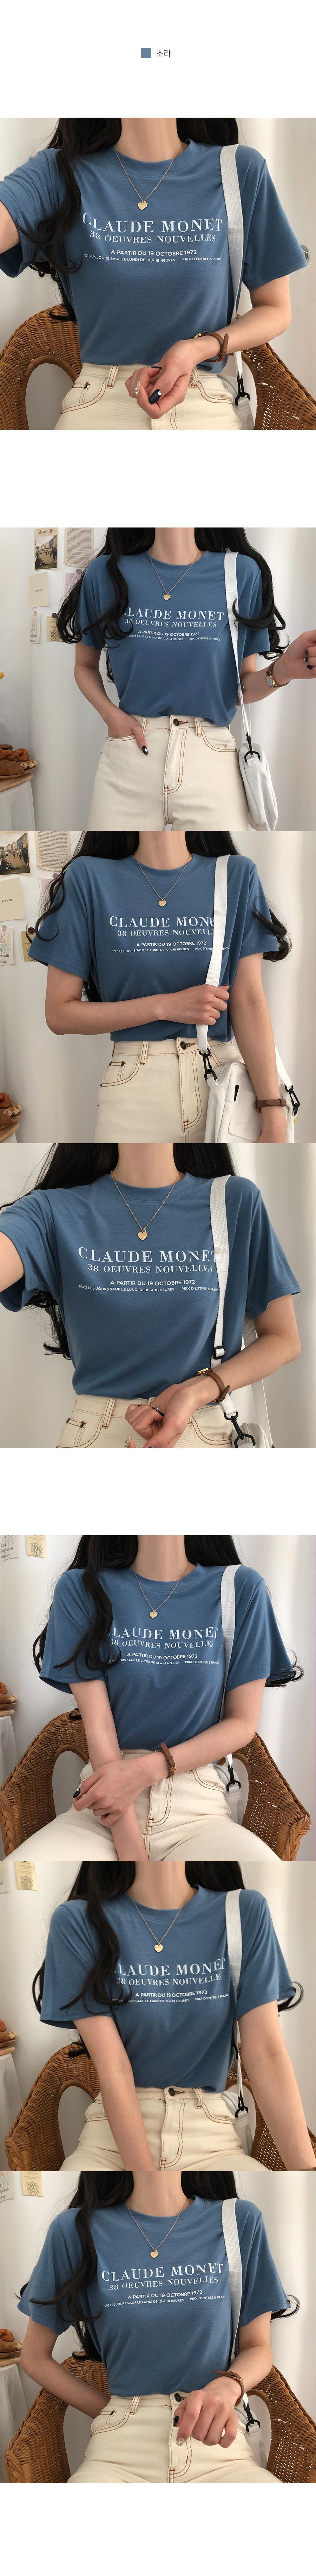 Claude Tencel lettering short-sleeved T-shirt